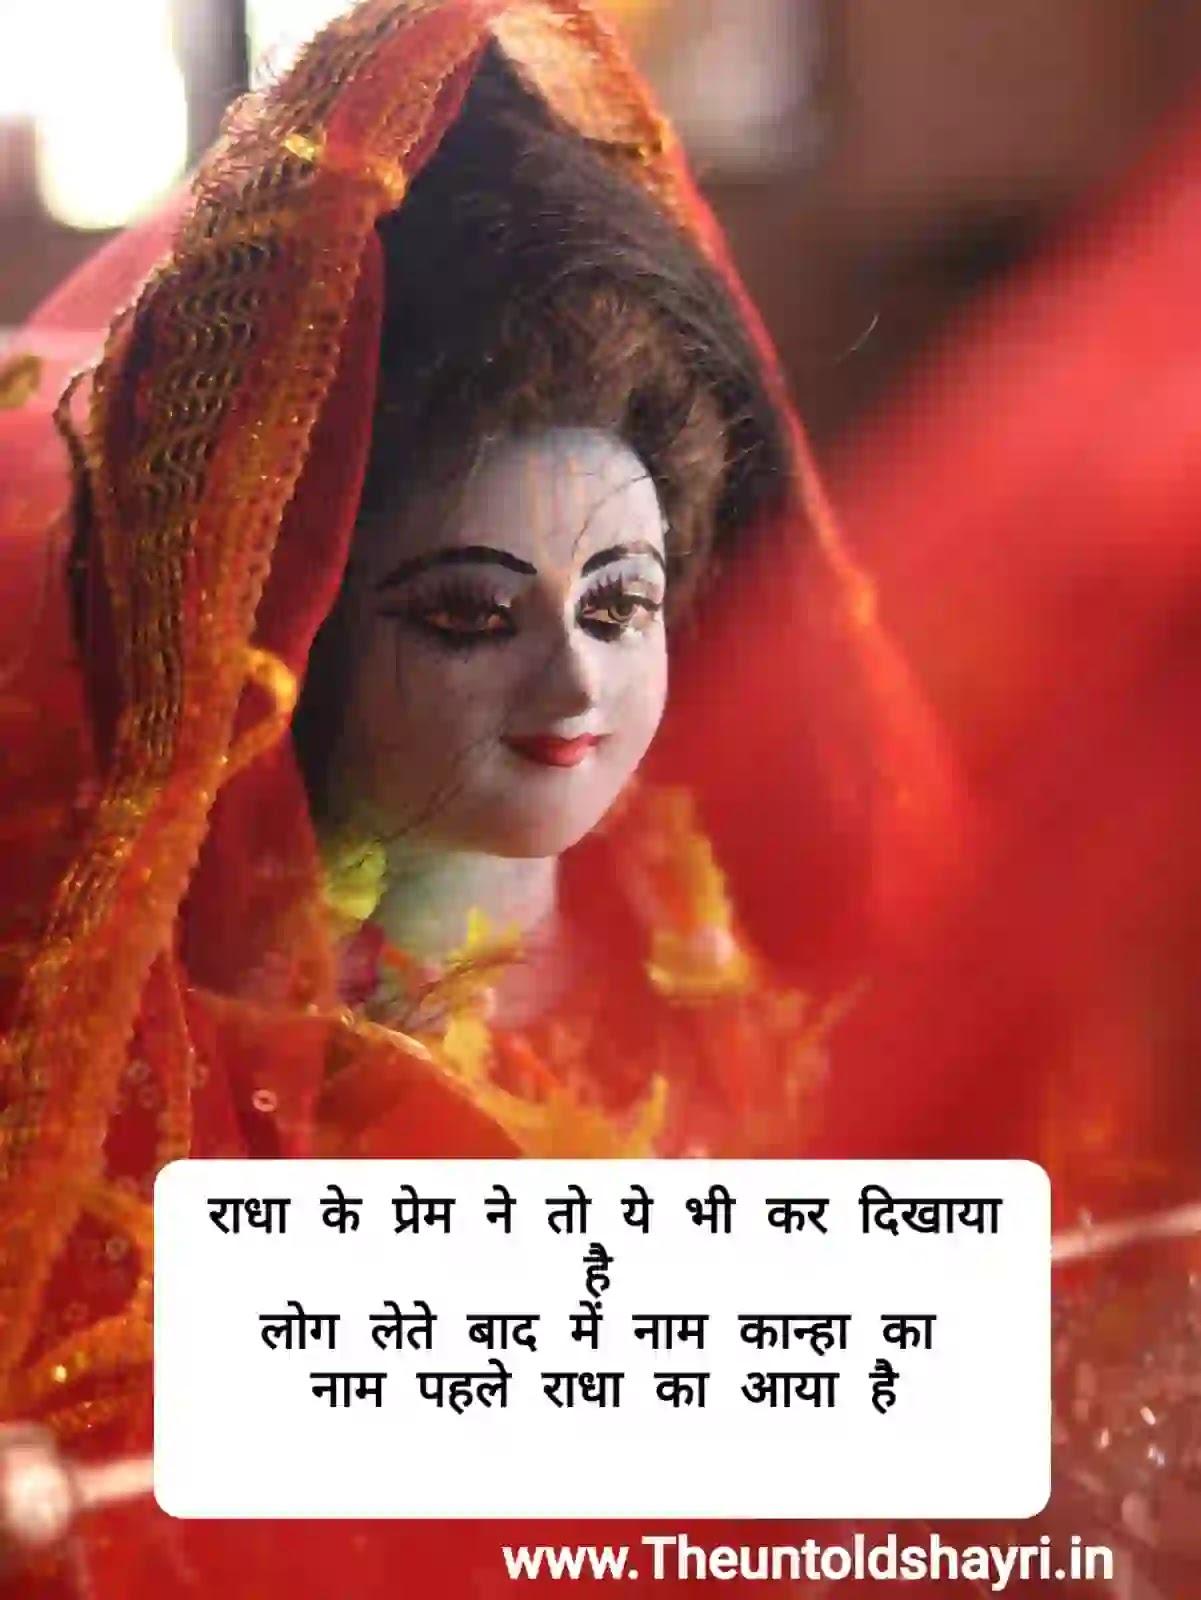 Collection of Lord Radhe Radhe Shayri 2021